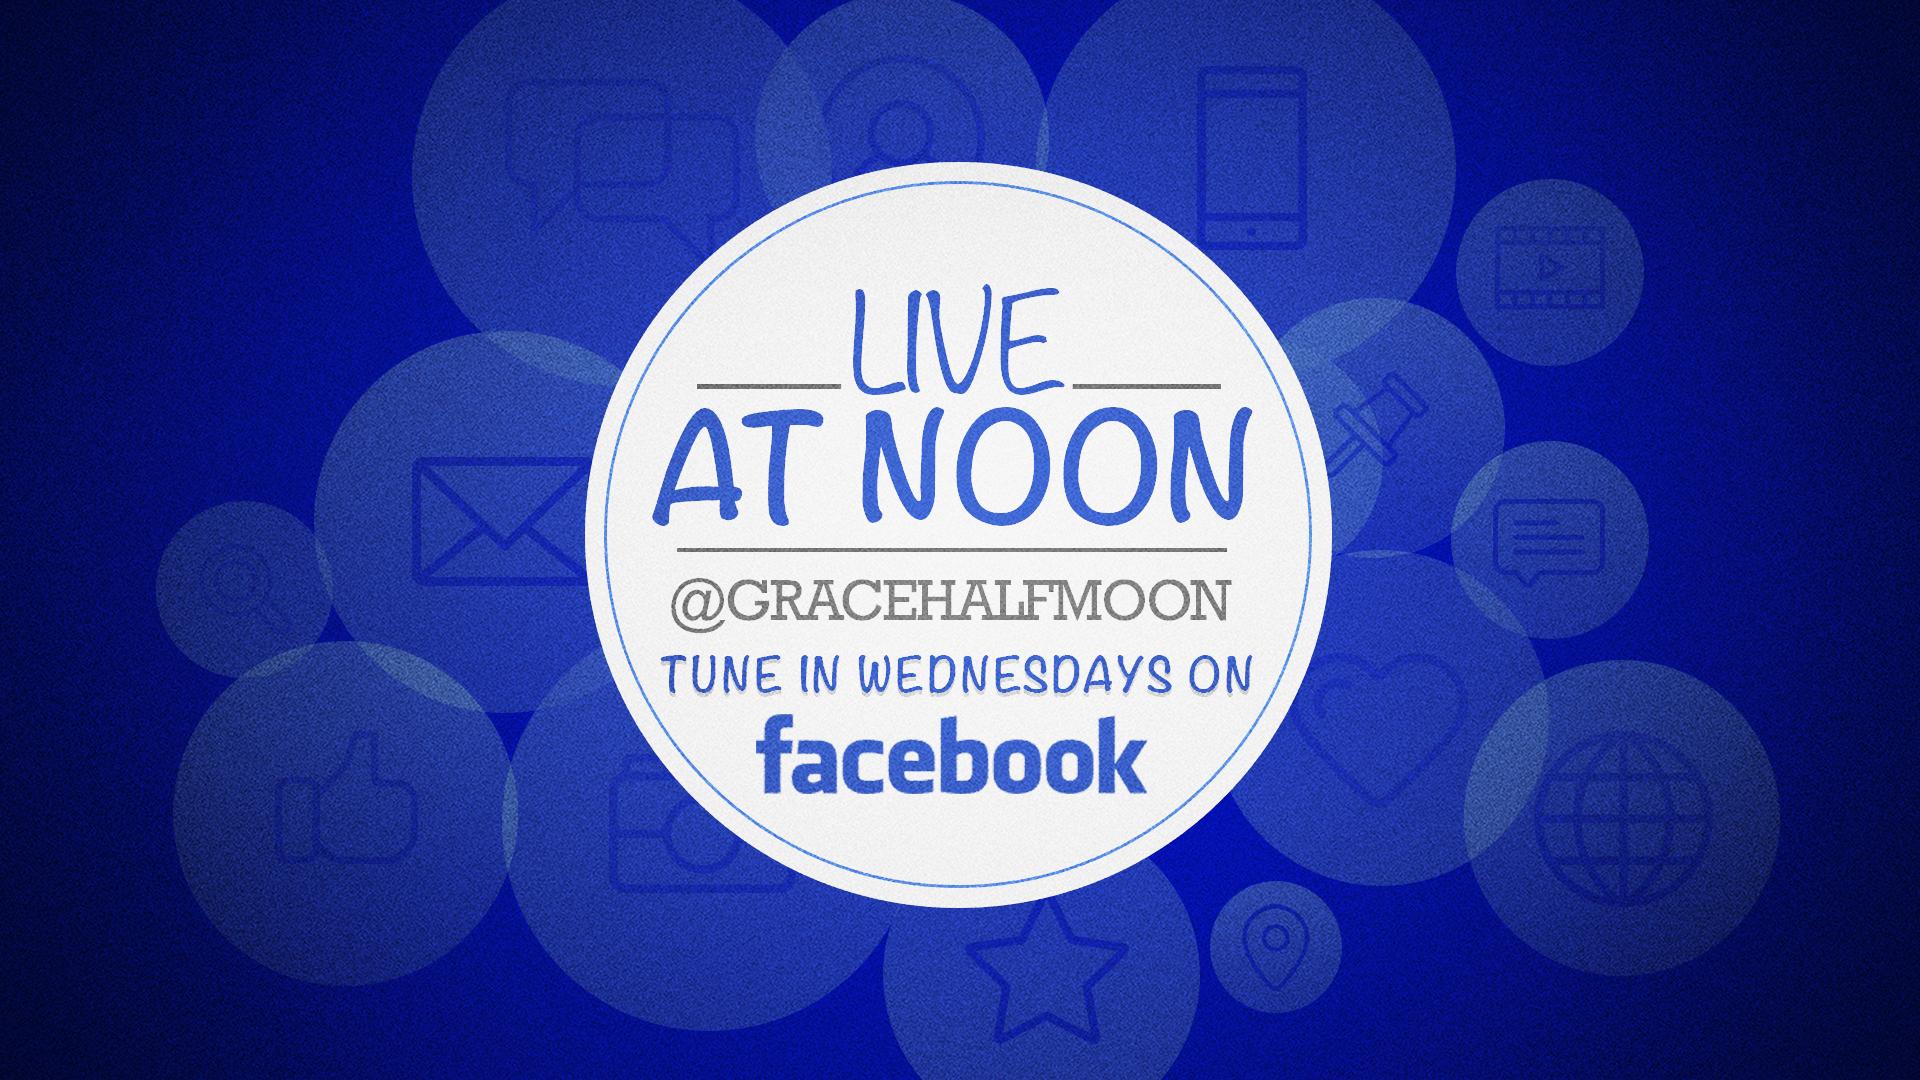 Live at Noon @halfmoon